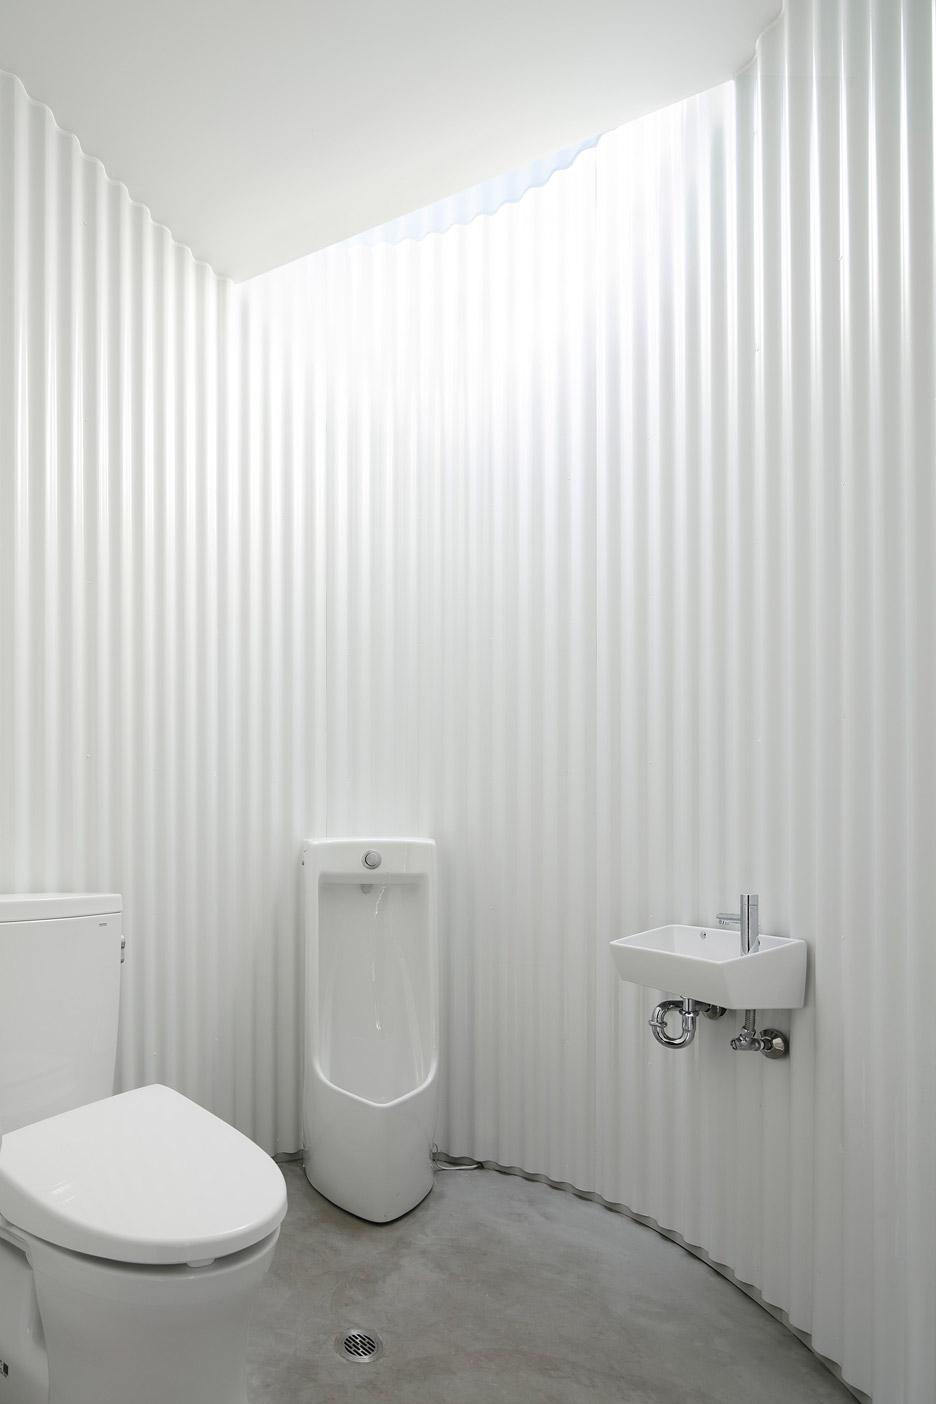 Kubo Tsushima designs public toilet for Japanese town